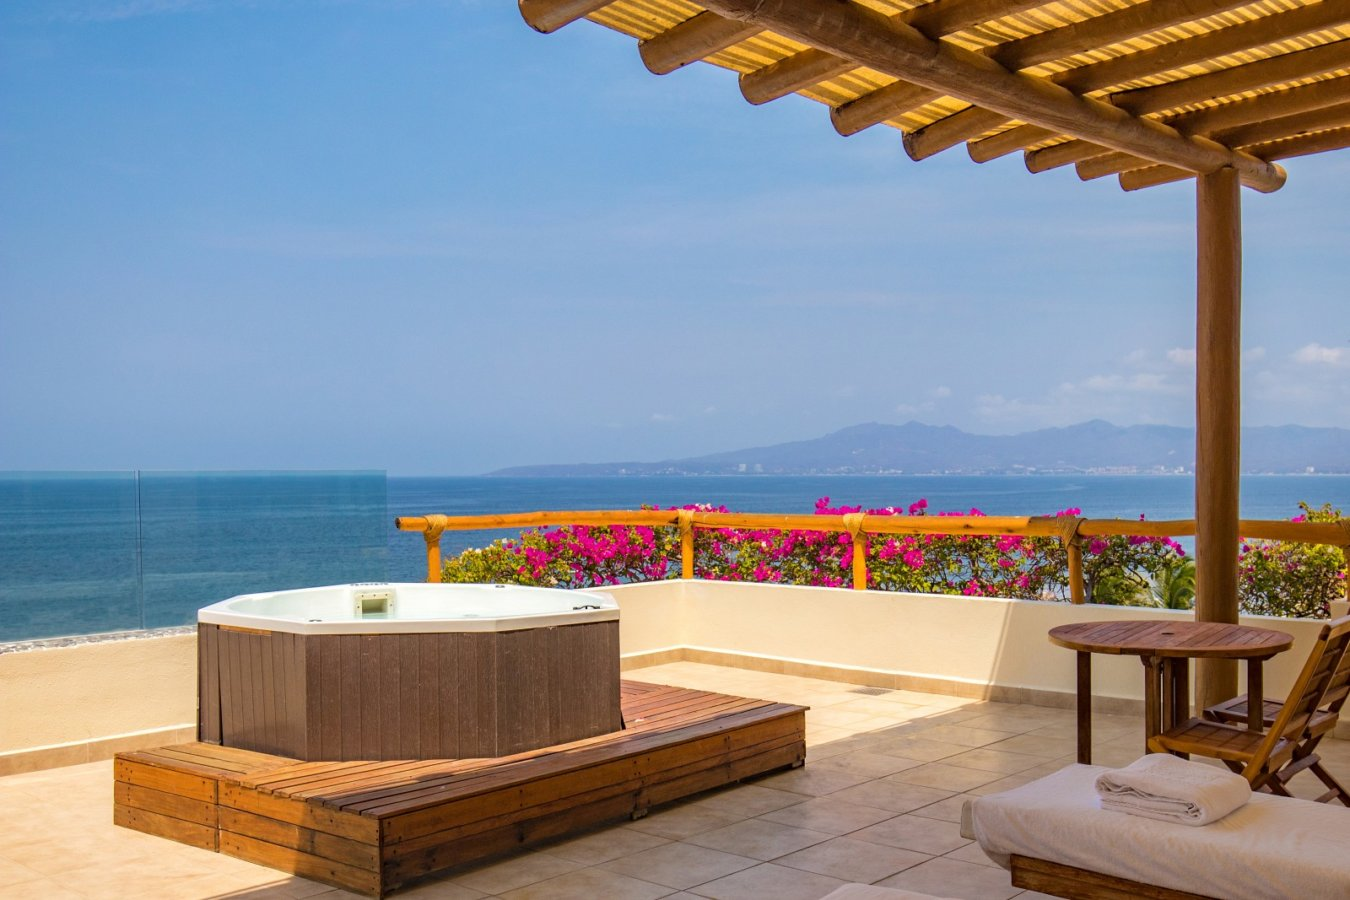 suite ocean view from Grand Velas Riviera Nayarit